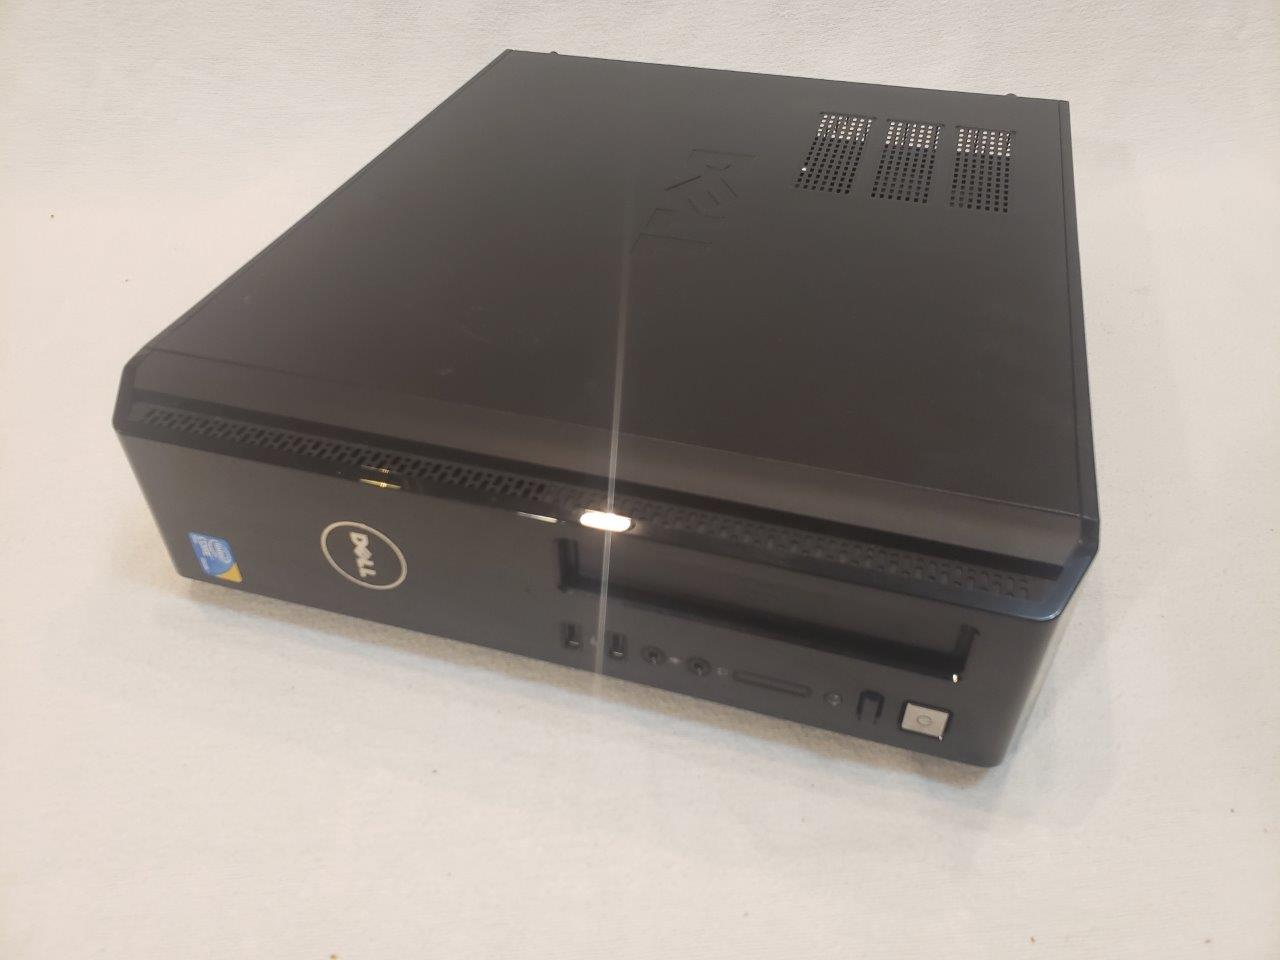 Dell desktop PC Intel Core 2 Quad 2.93 GHz 4 GB RAM 320 GB HDD Windows 10 Pro small